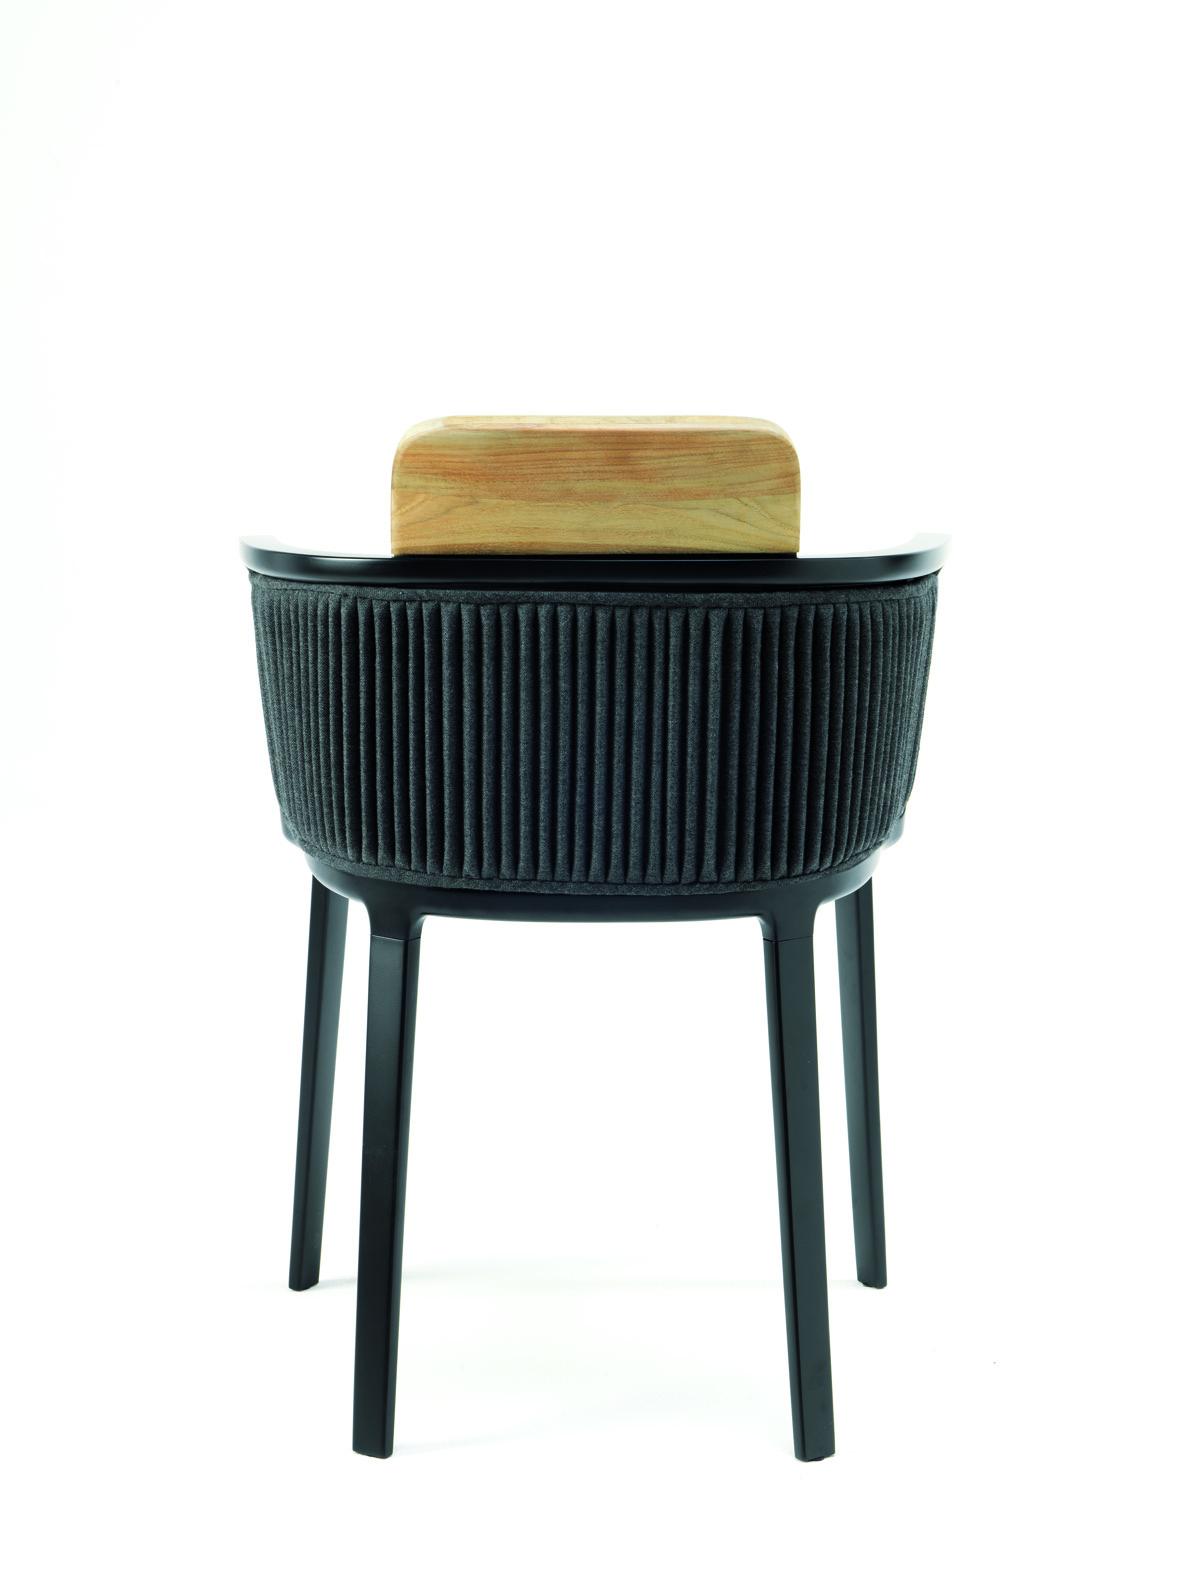 diseño del asiento nicolette Patrick Norguet para Ethimo